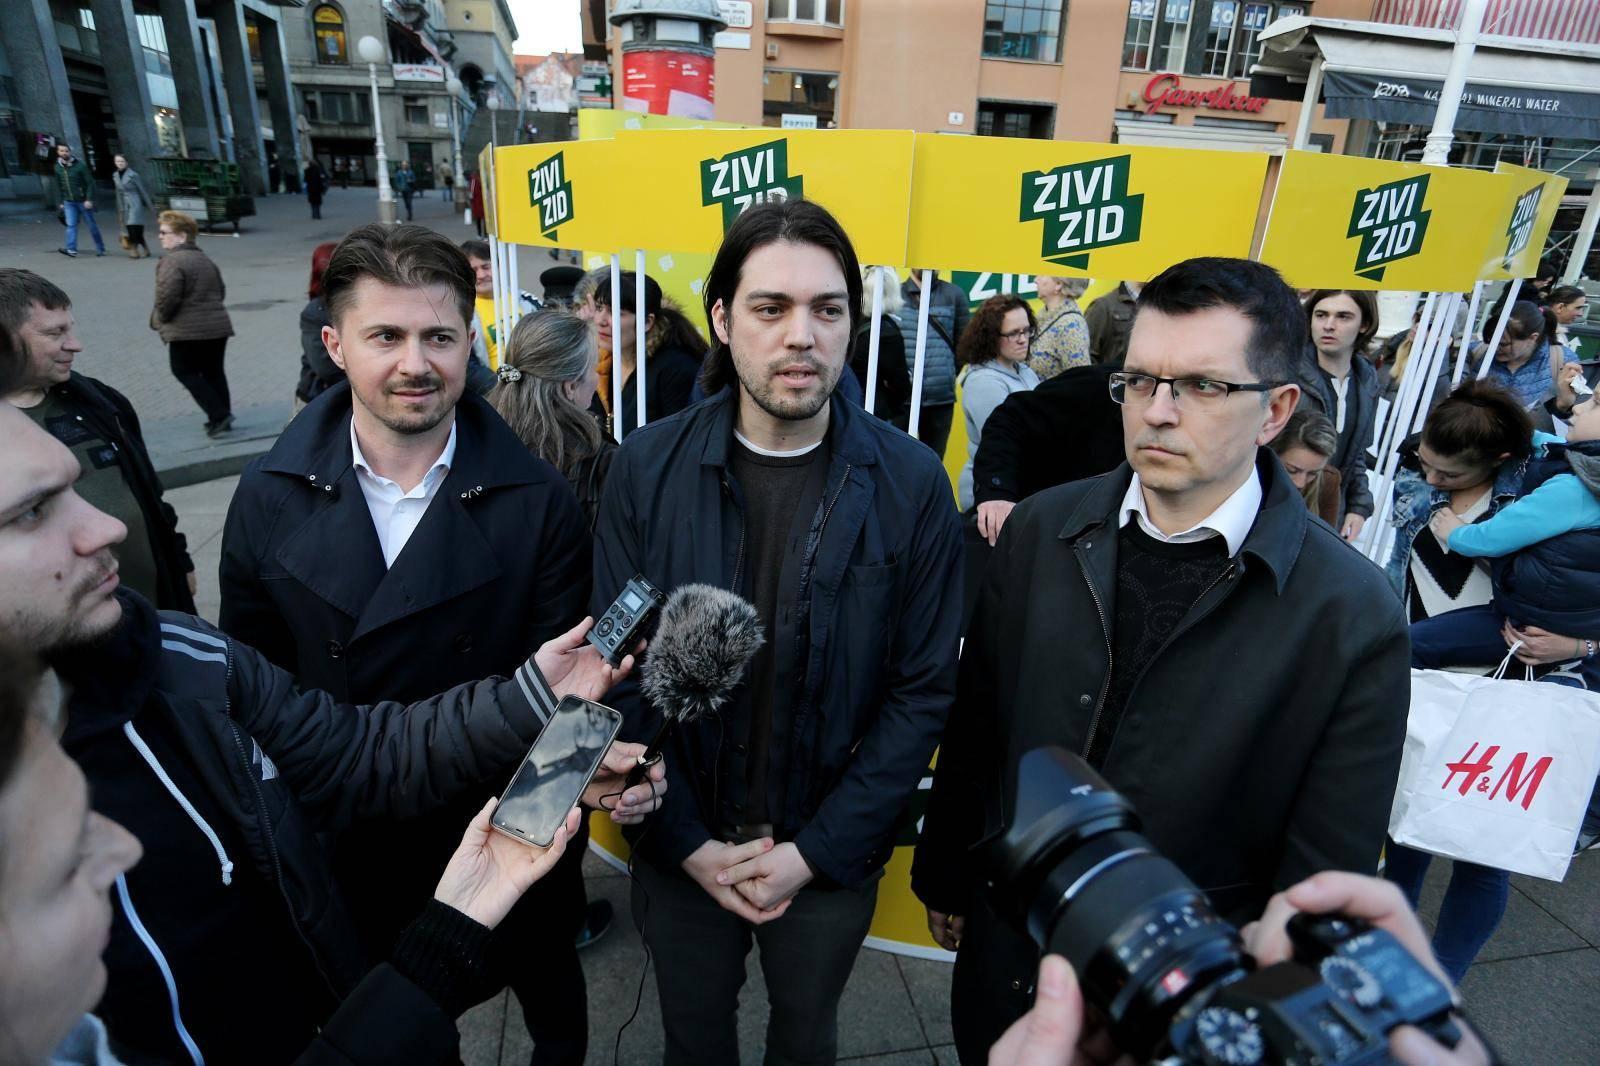 Zagreb: Živi zid na glavnom Trgu govorio o ministrici Murganić i centrima za socijalnu skrb